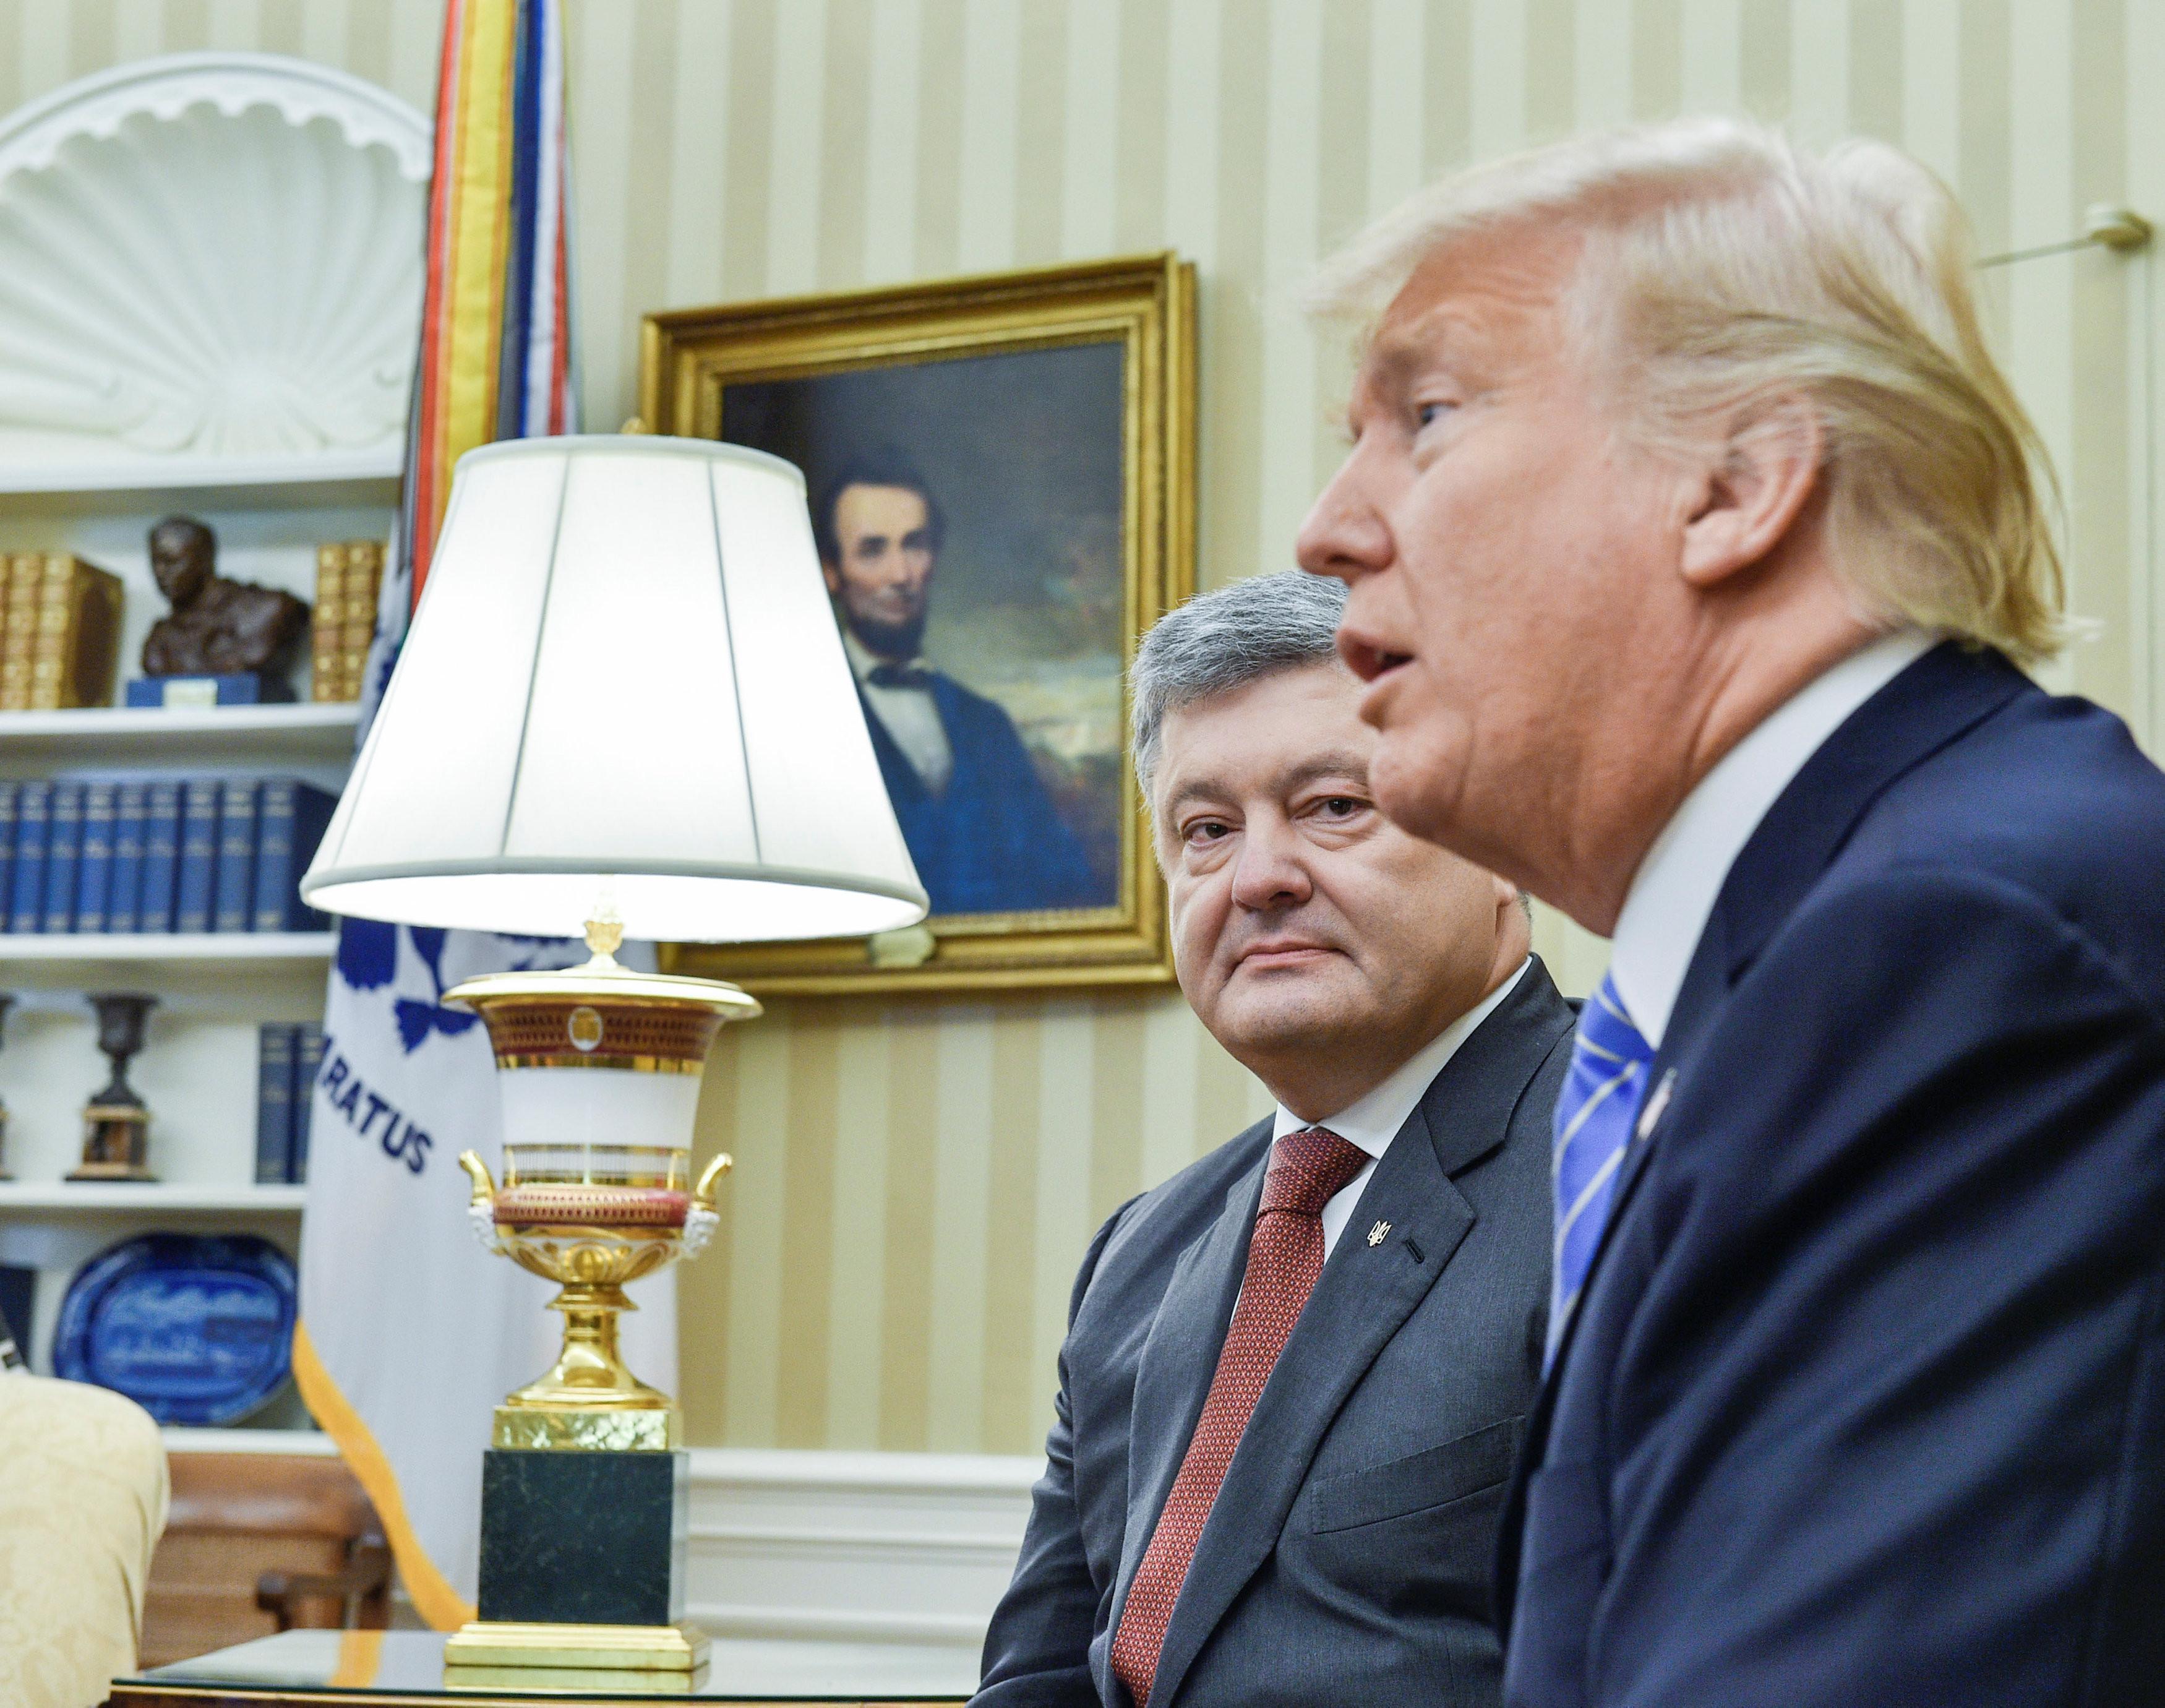 <p>Президент Украины Пётр Порошенко и президент США Дональд Трамп. Фото: &copy;REUTERS/<span>Mykola Lazarenko</span></p>